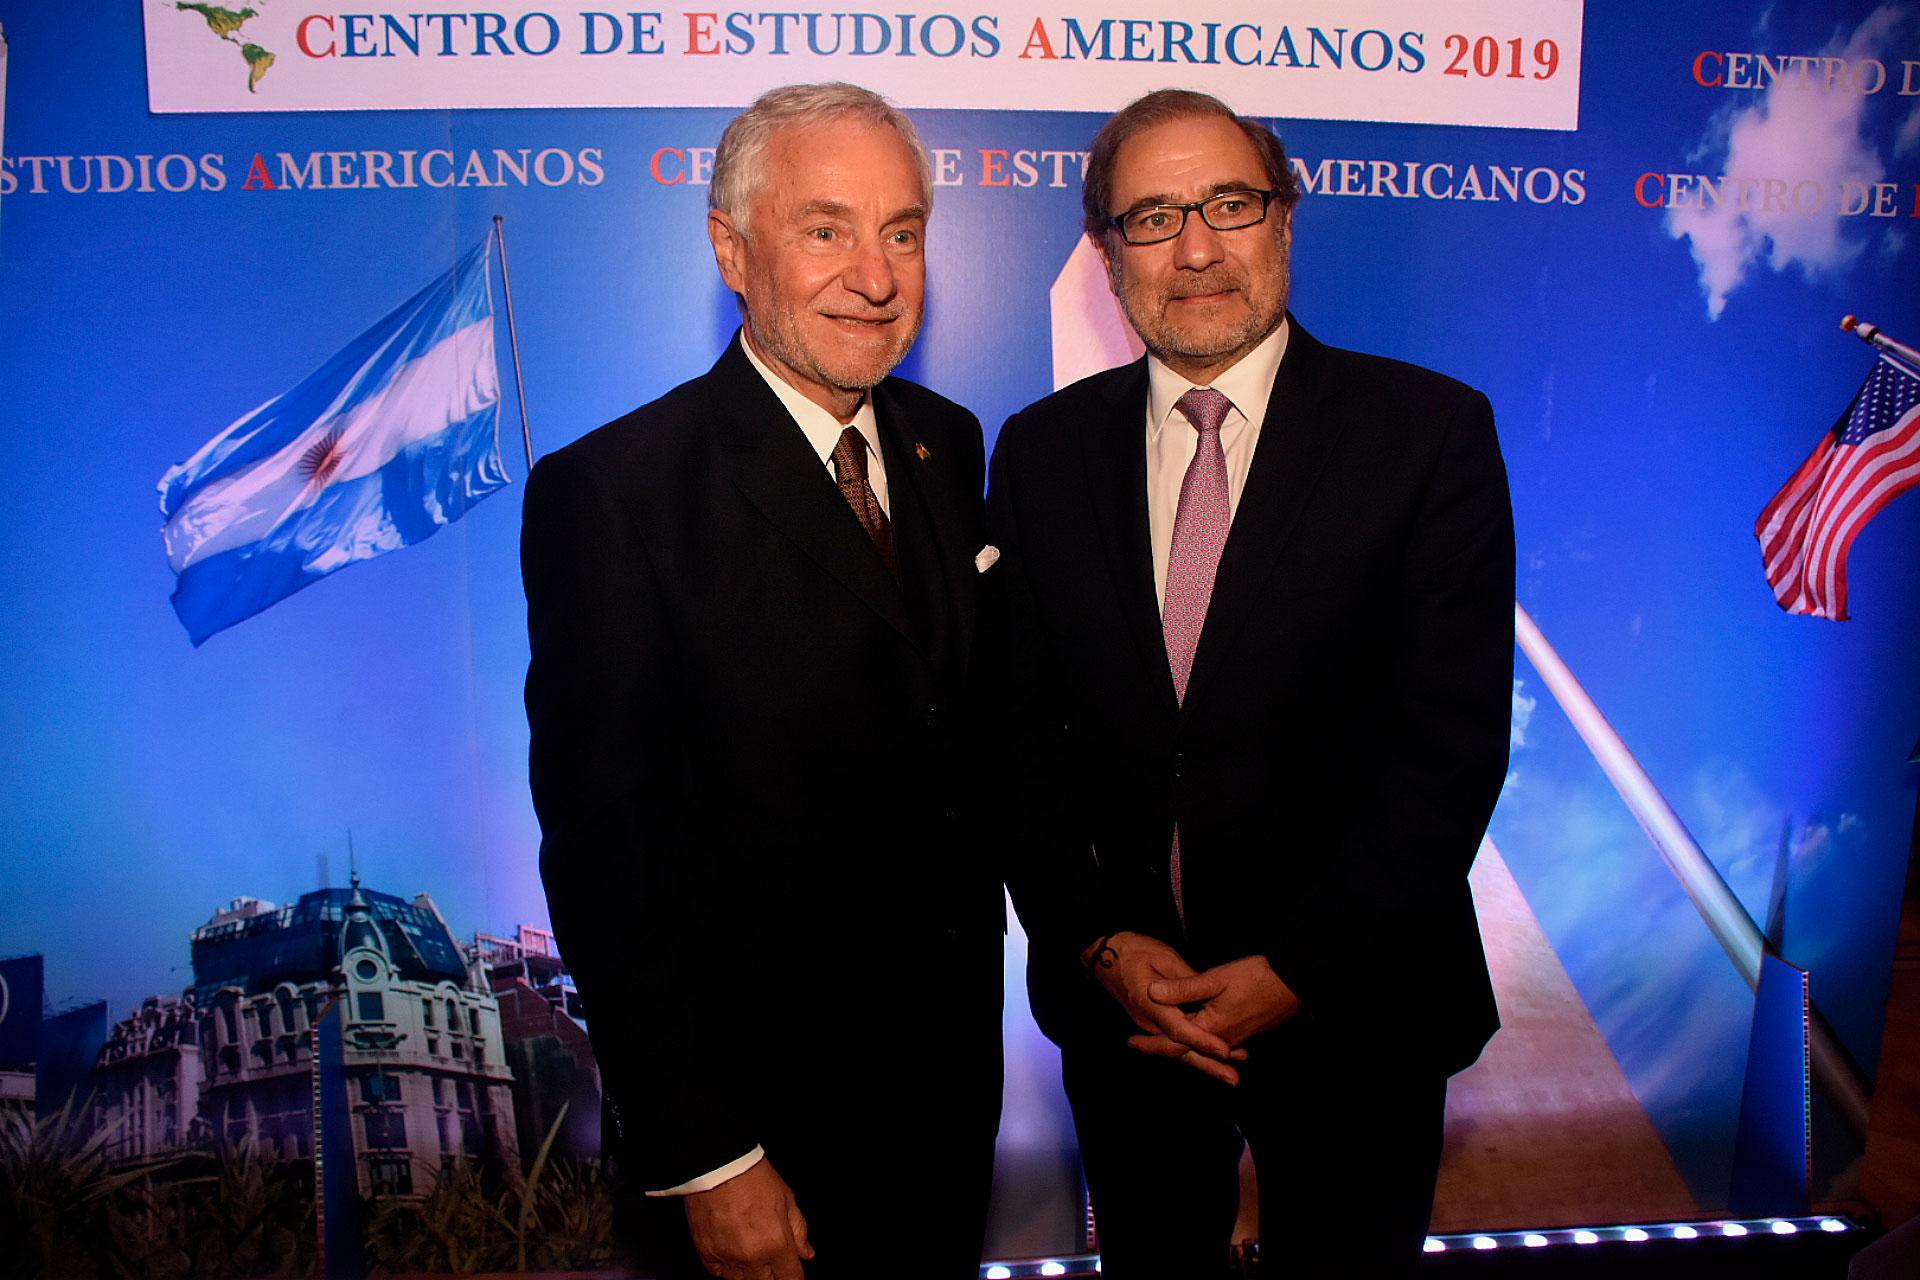 Savino junto al referente de política exterior de Alberto Fernández, Jorge Arguello